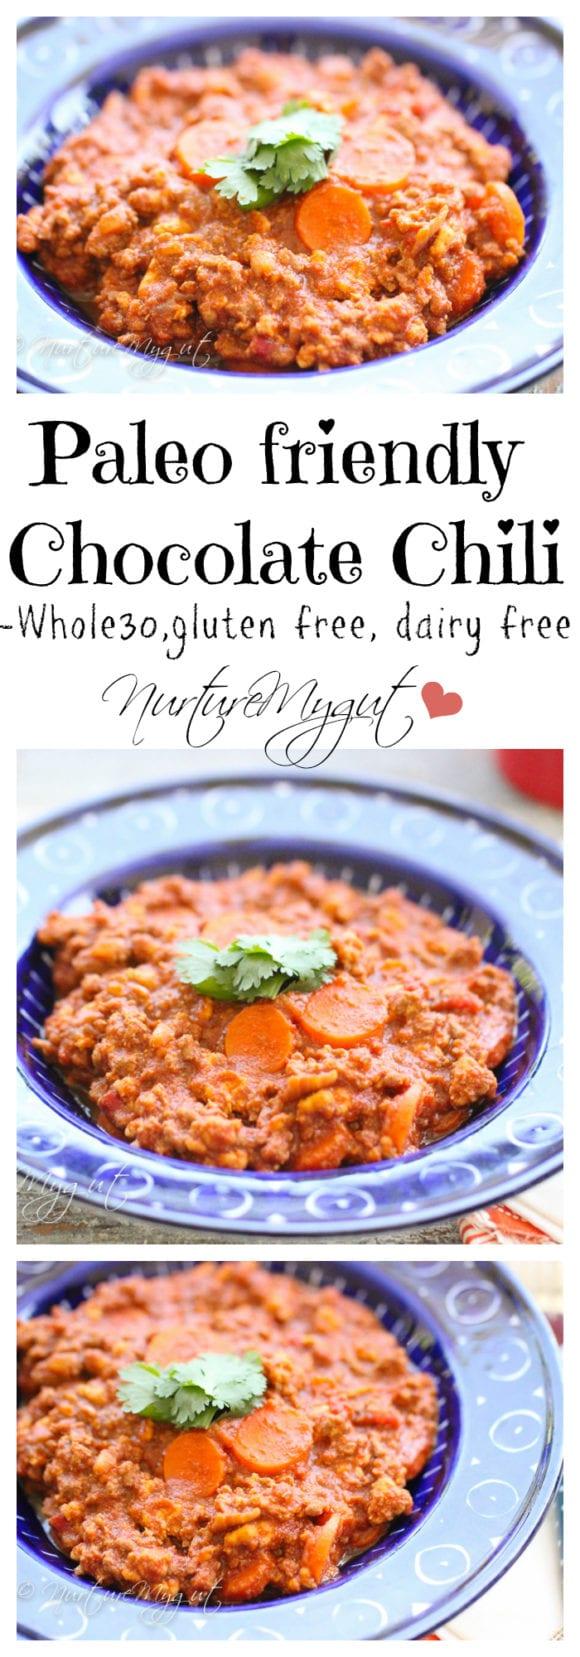 paleo friendly chocolate chili